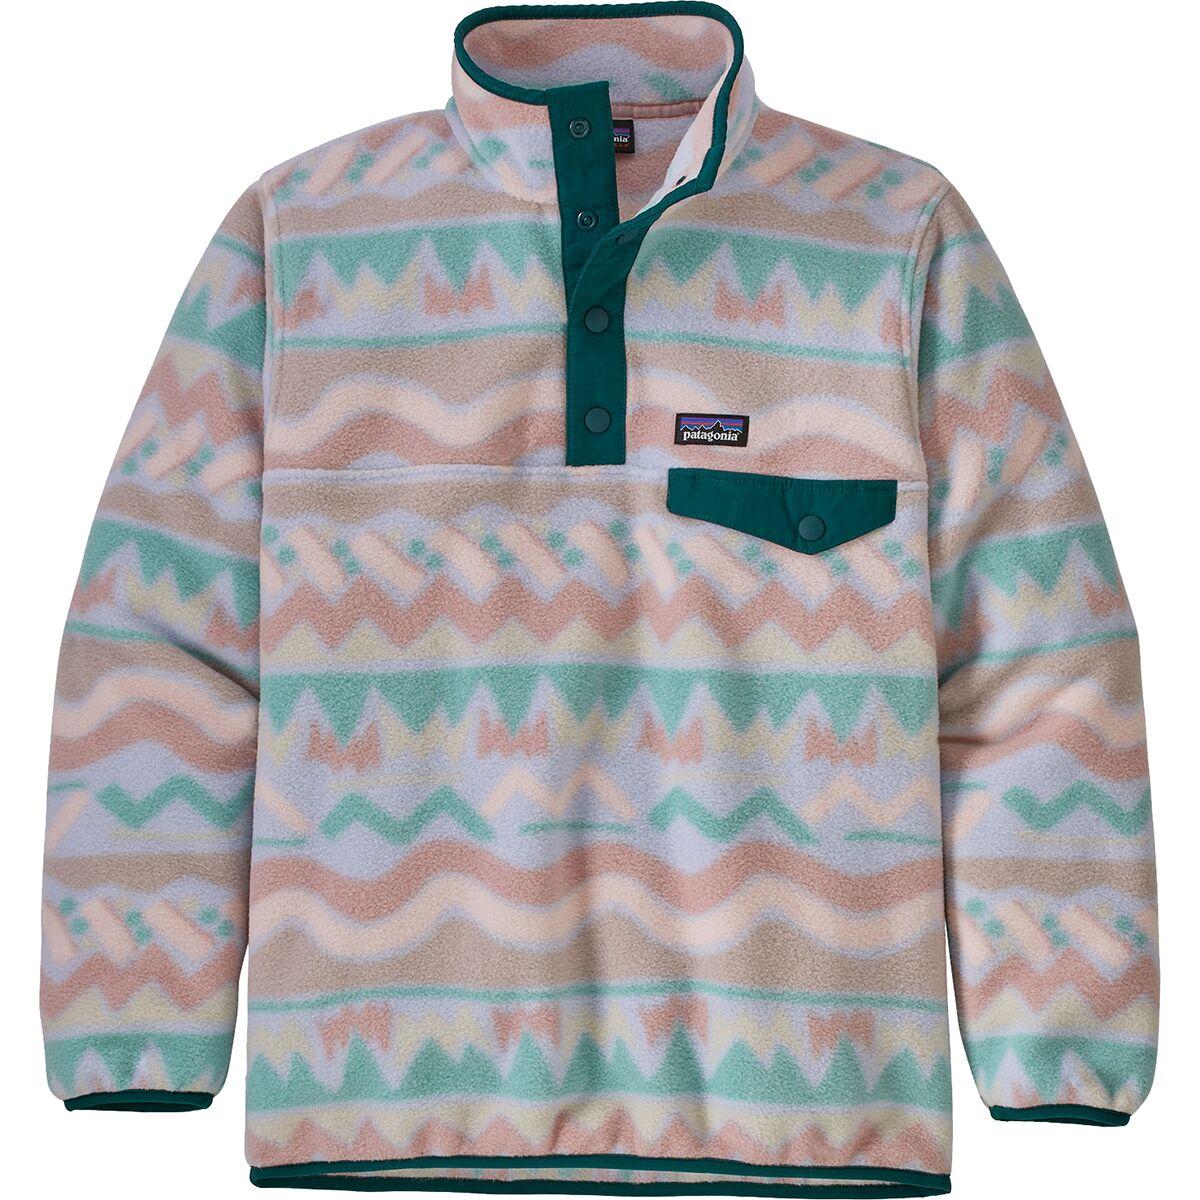 Lightweight Synchilla Snap-T Pullover Fleece Jacket - Girls